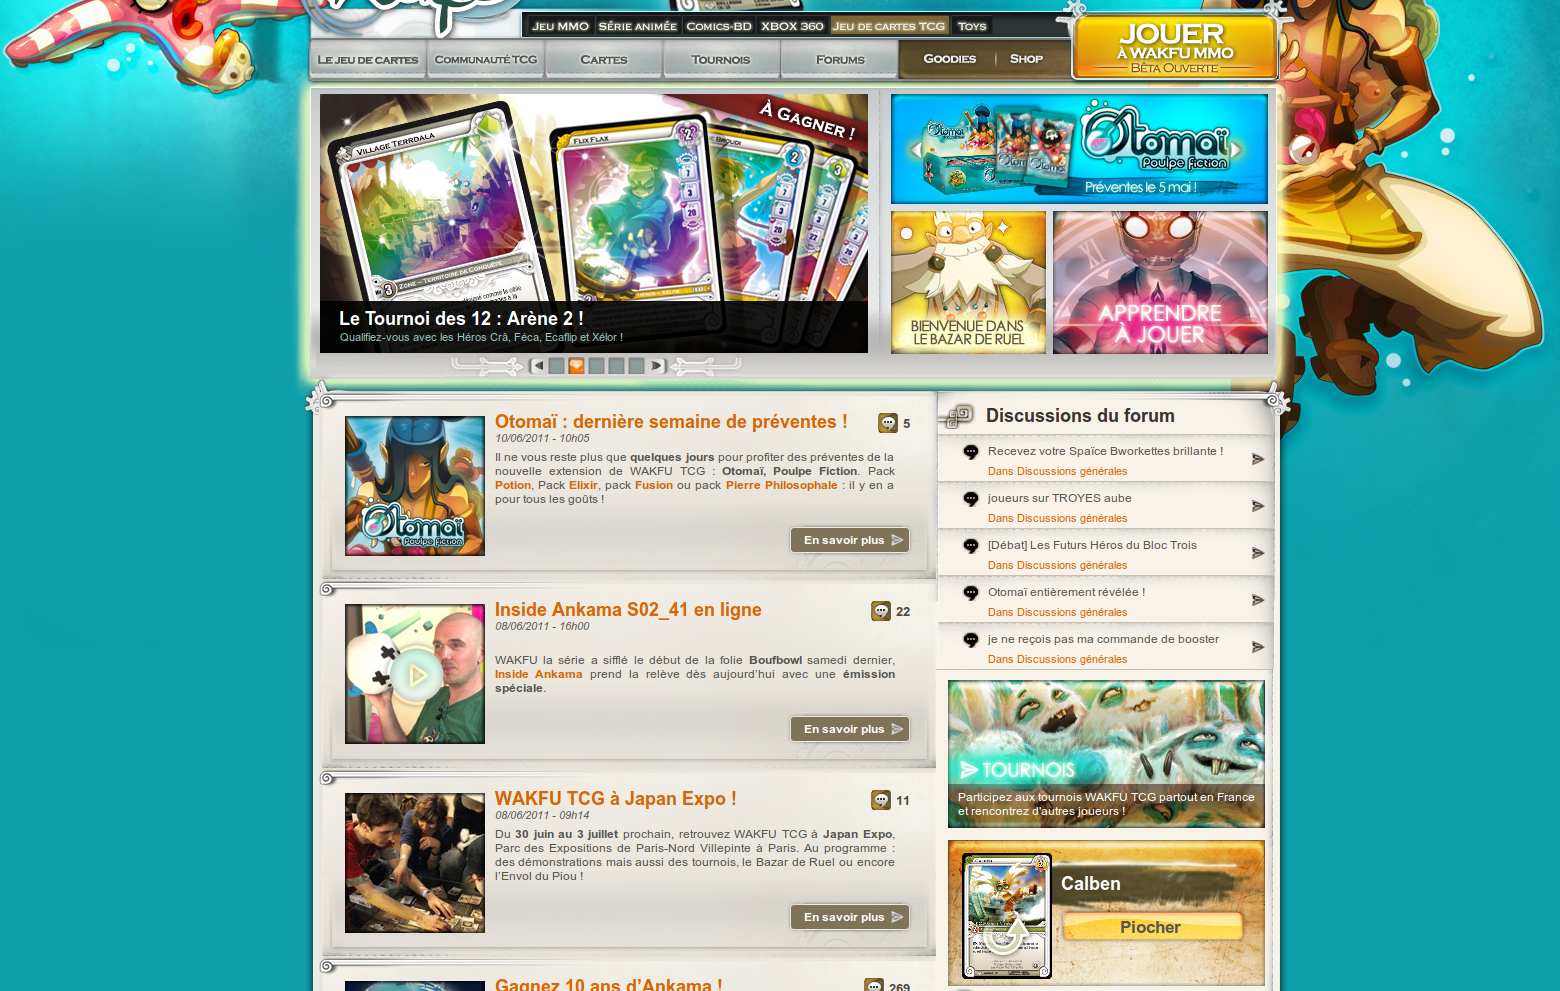 http://www.opusdei-dofus.fr/images-upload/YS-Tchook-news-wakfu-tcg.png